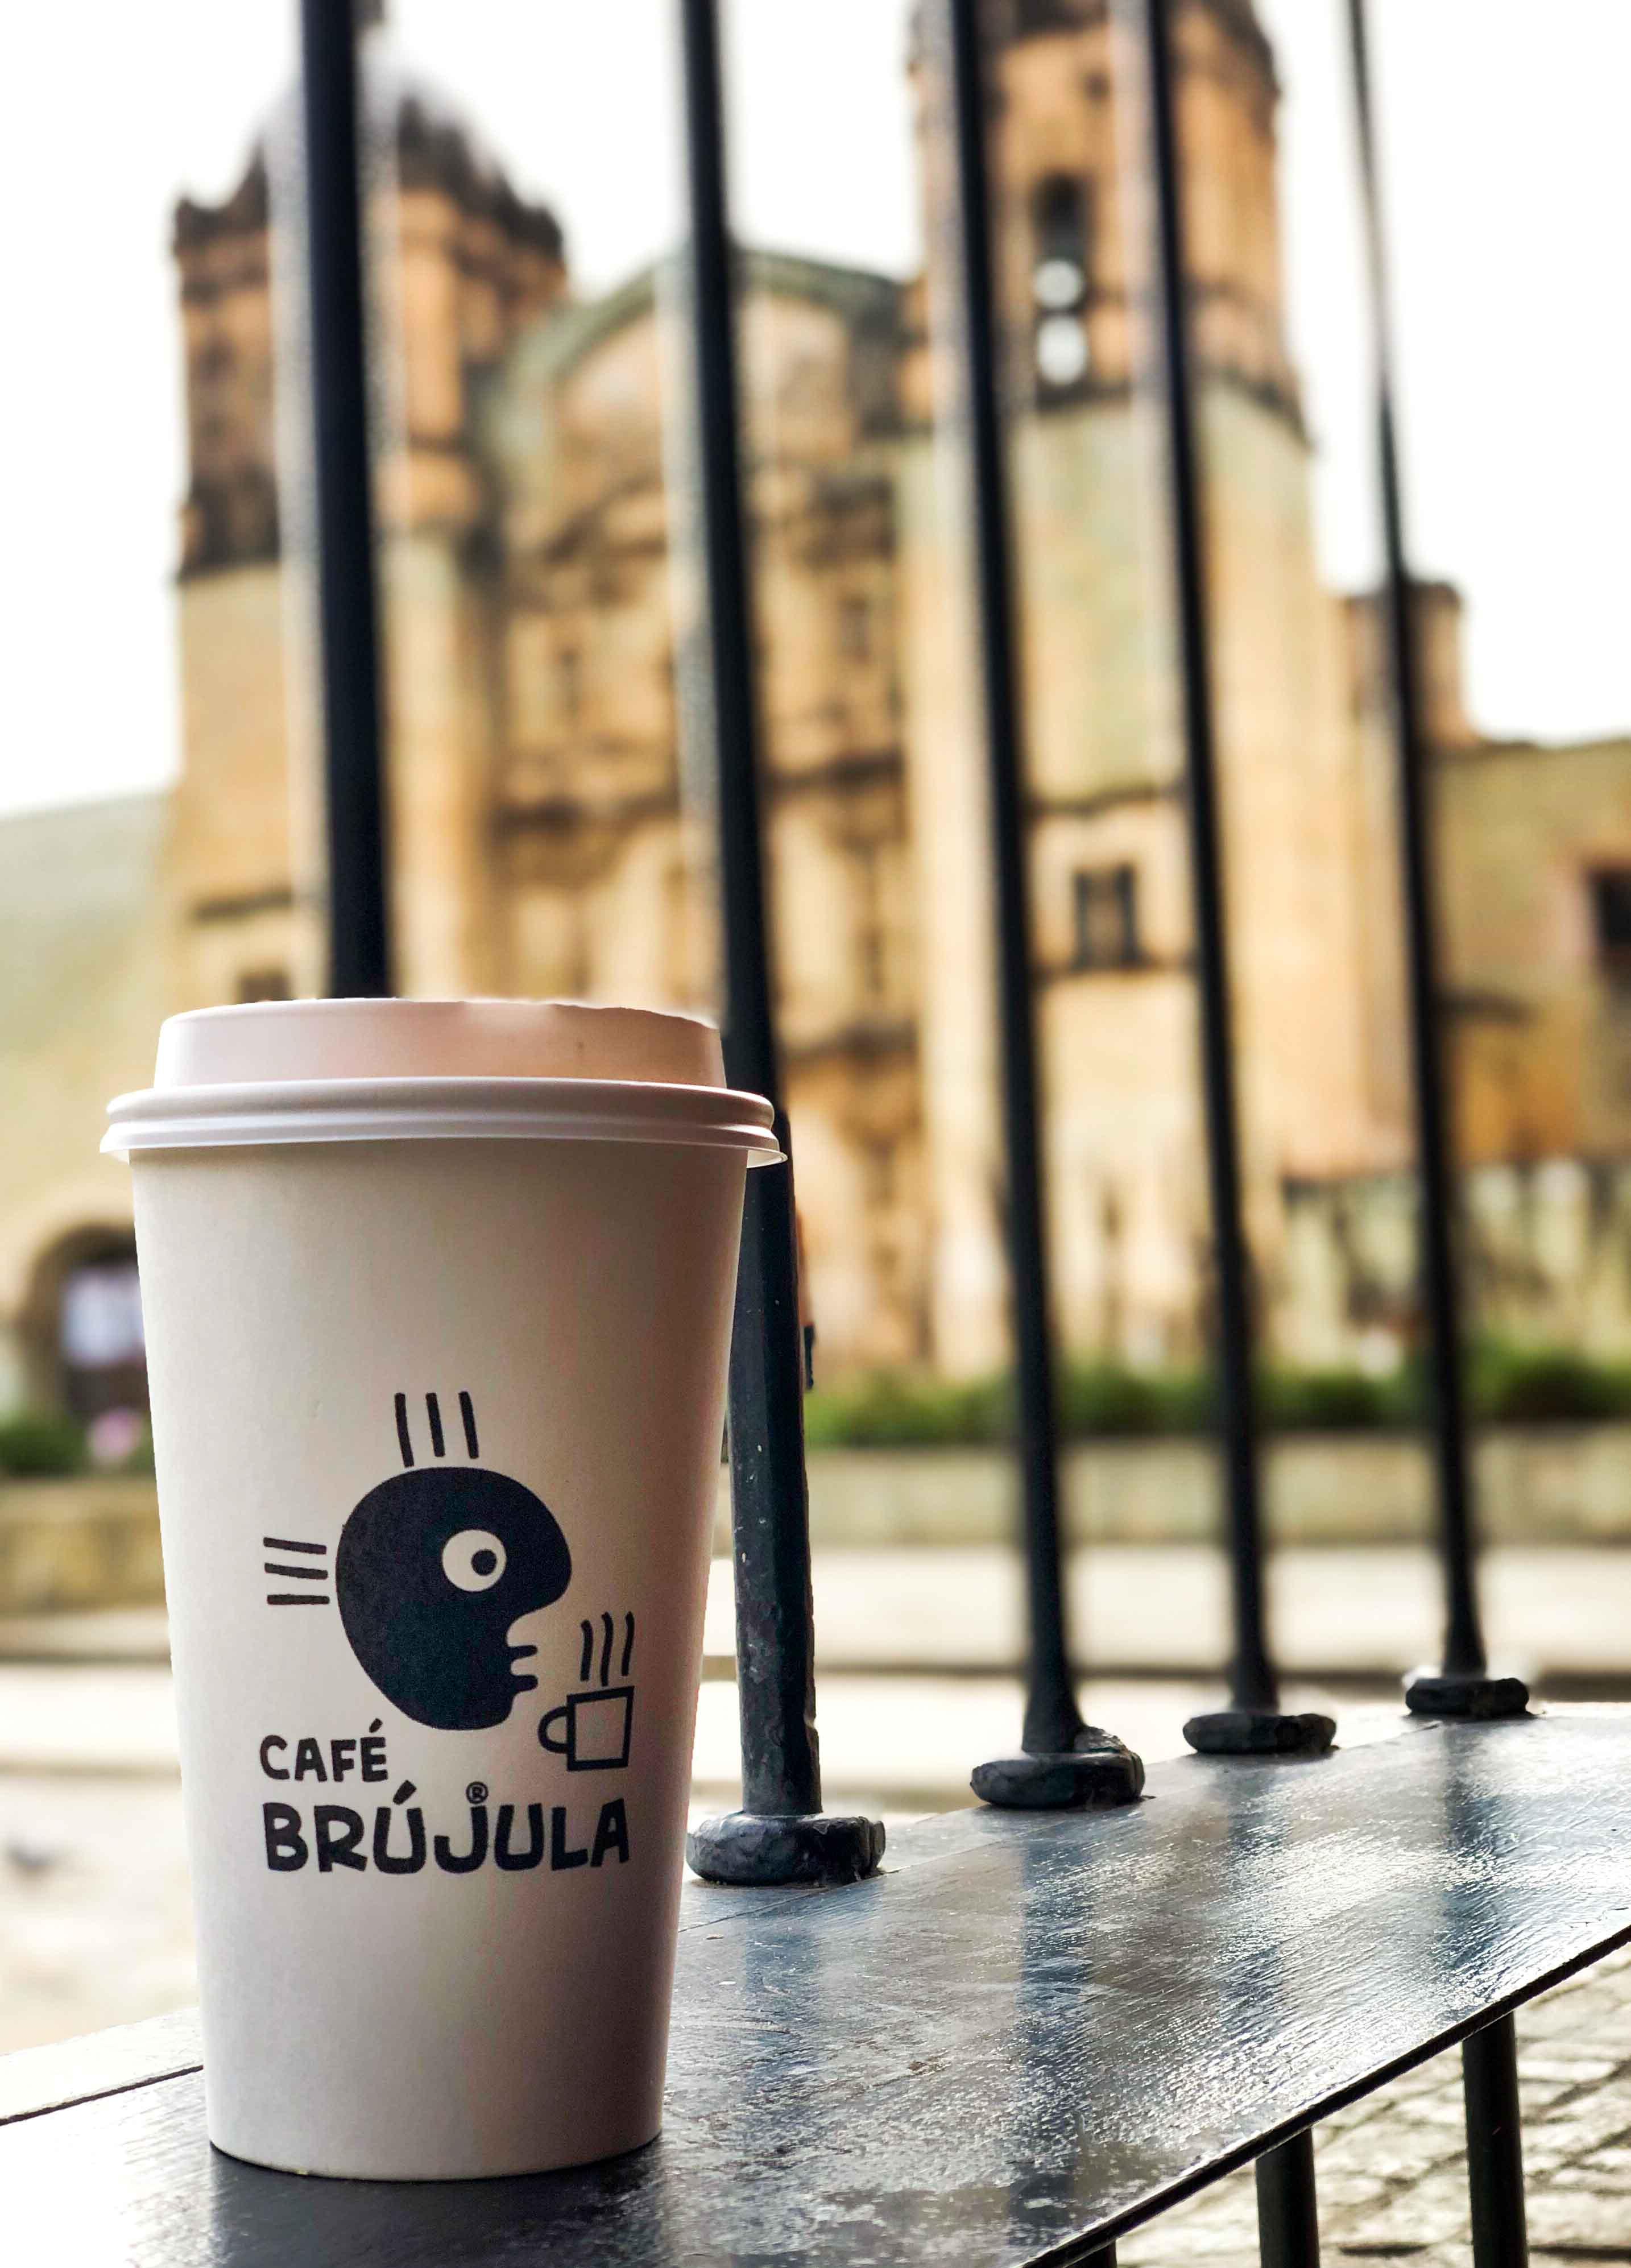 Brujula cafe Oaxaca